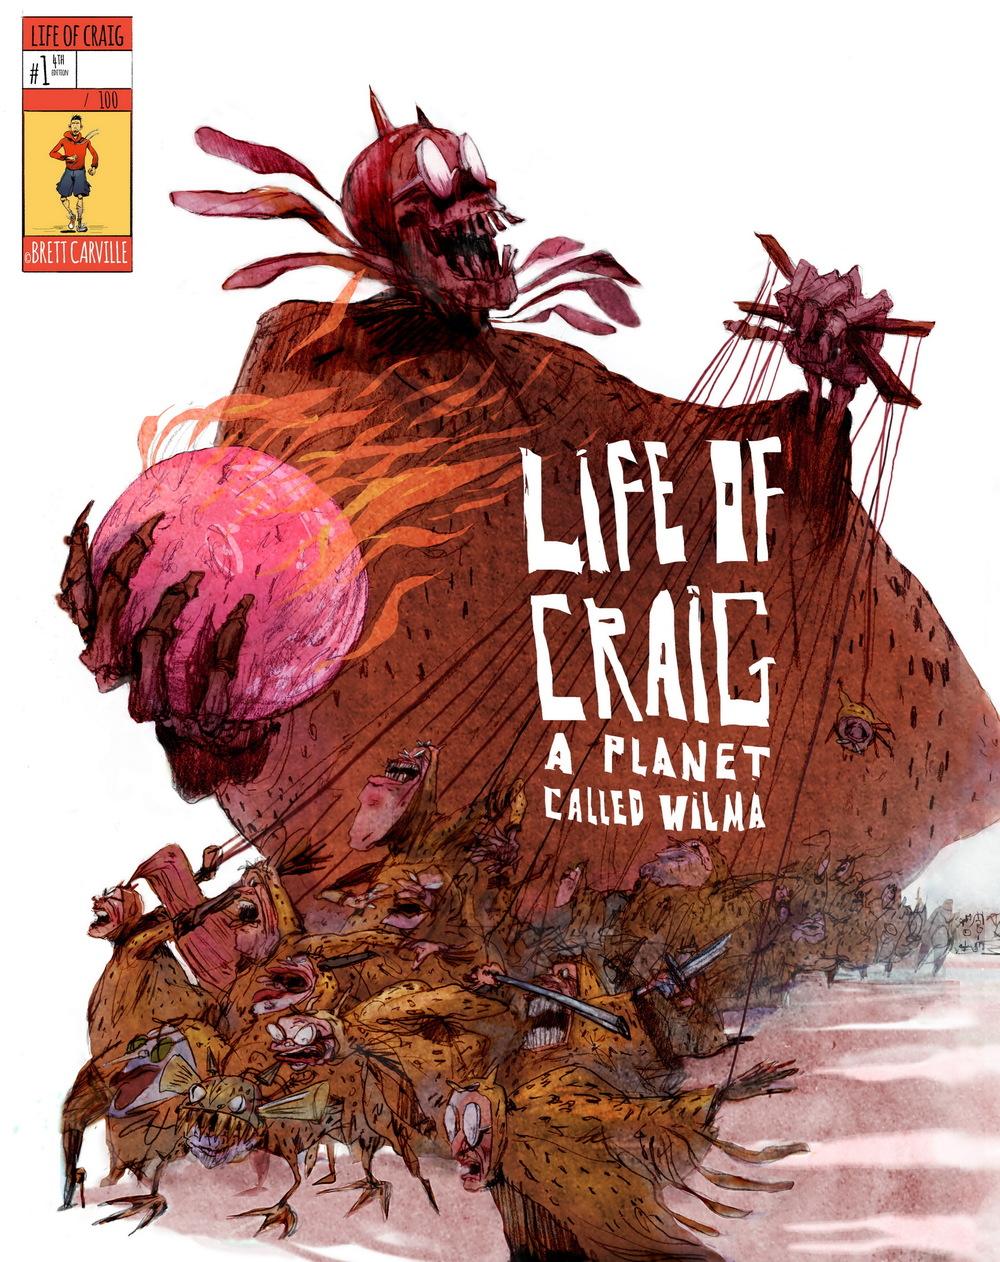 1 life of craig 4th edition cover jpeg copy.jpg